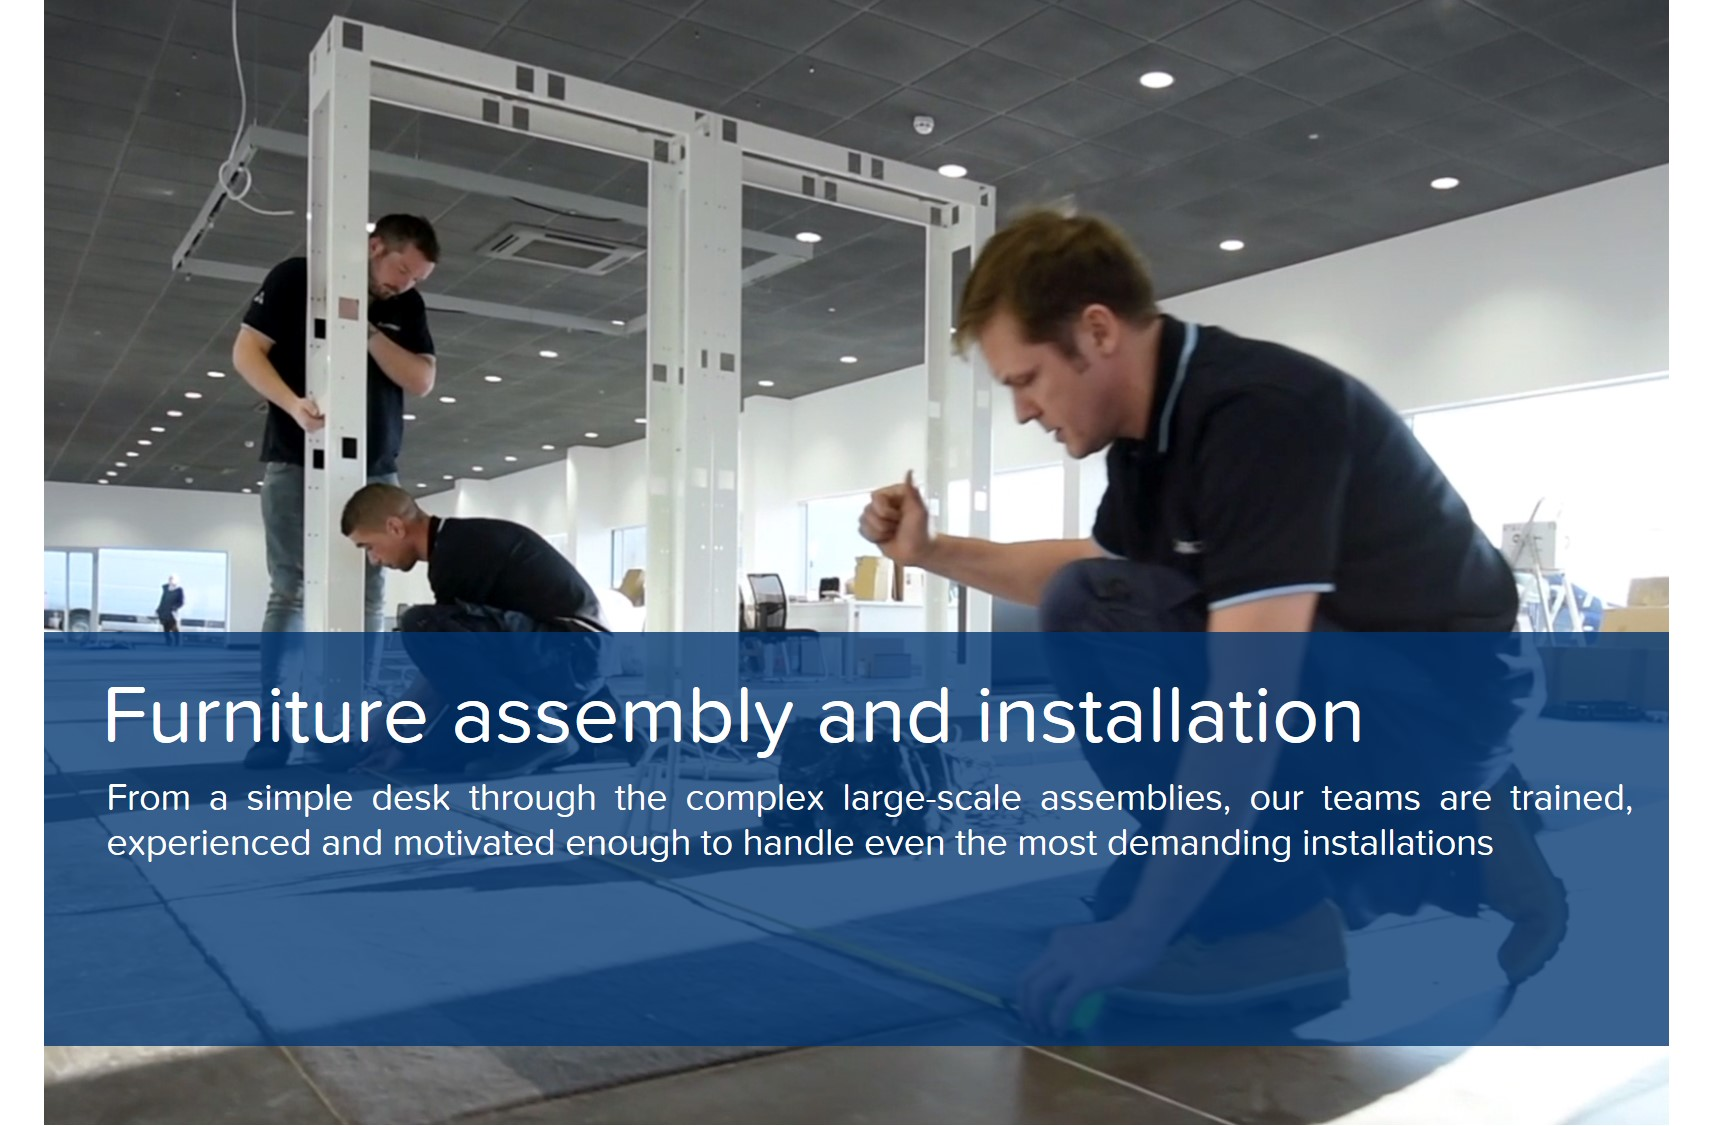 showroom design furniture assembly installation